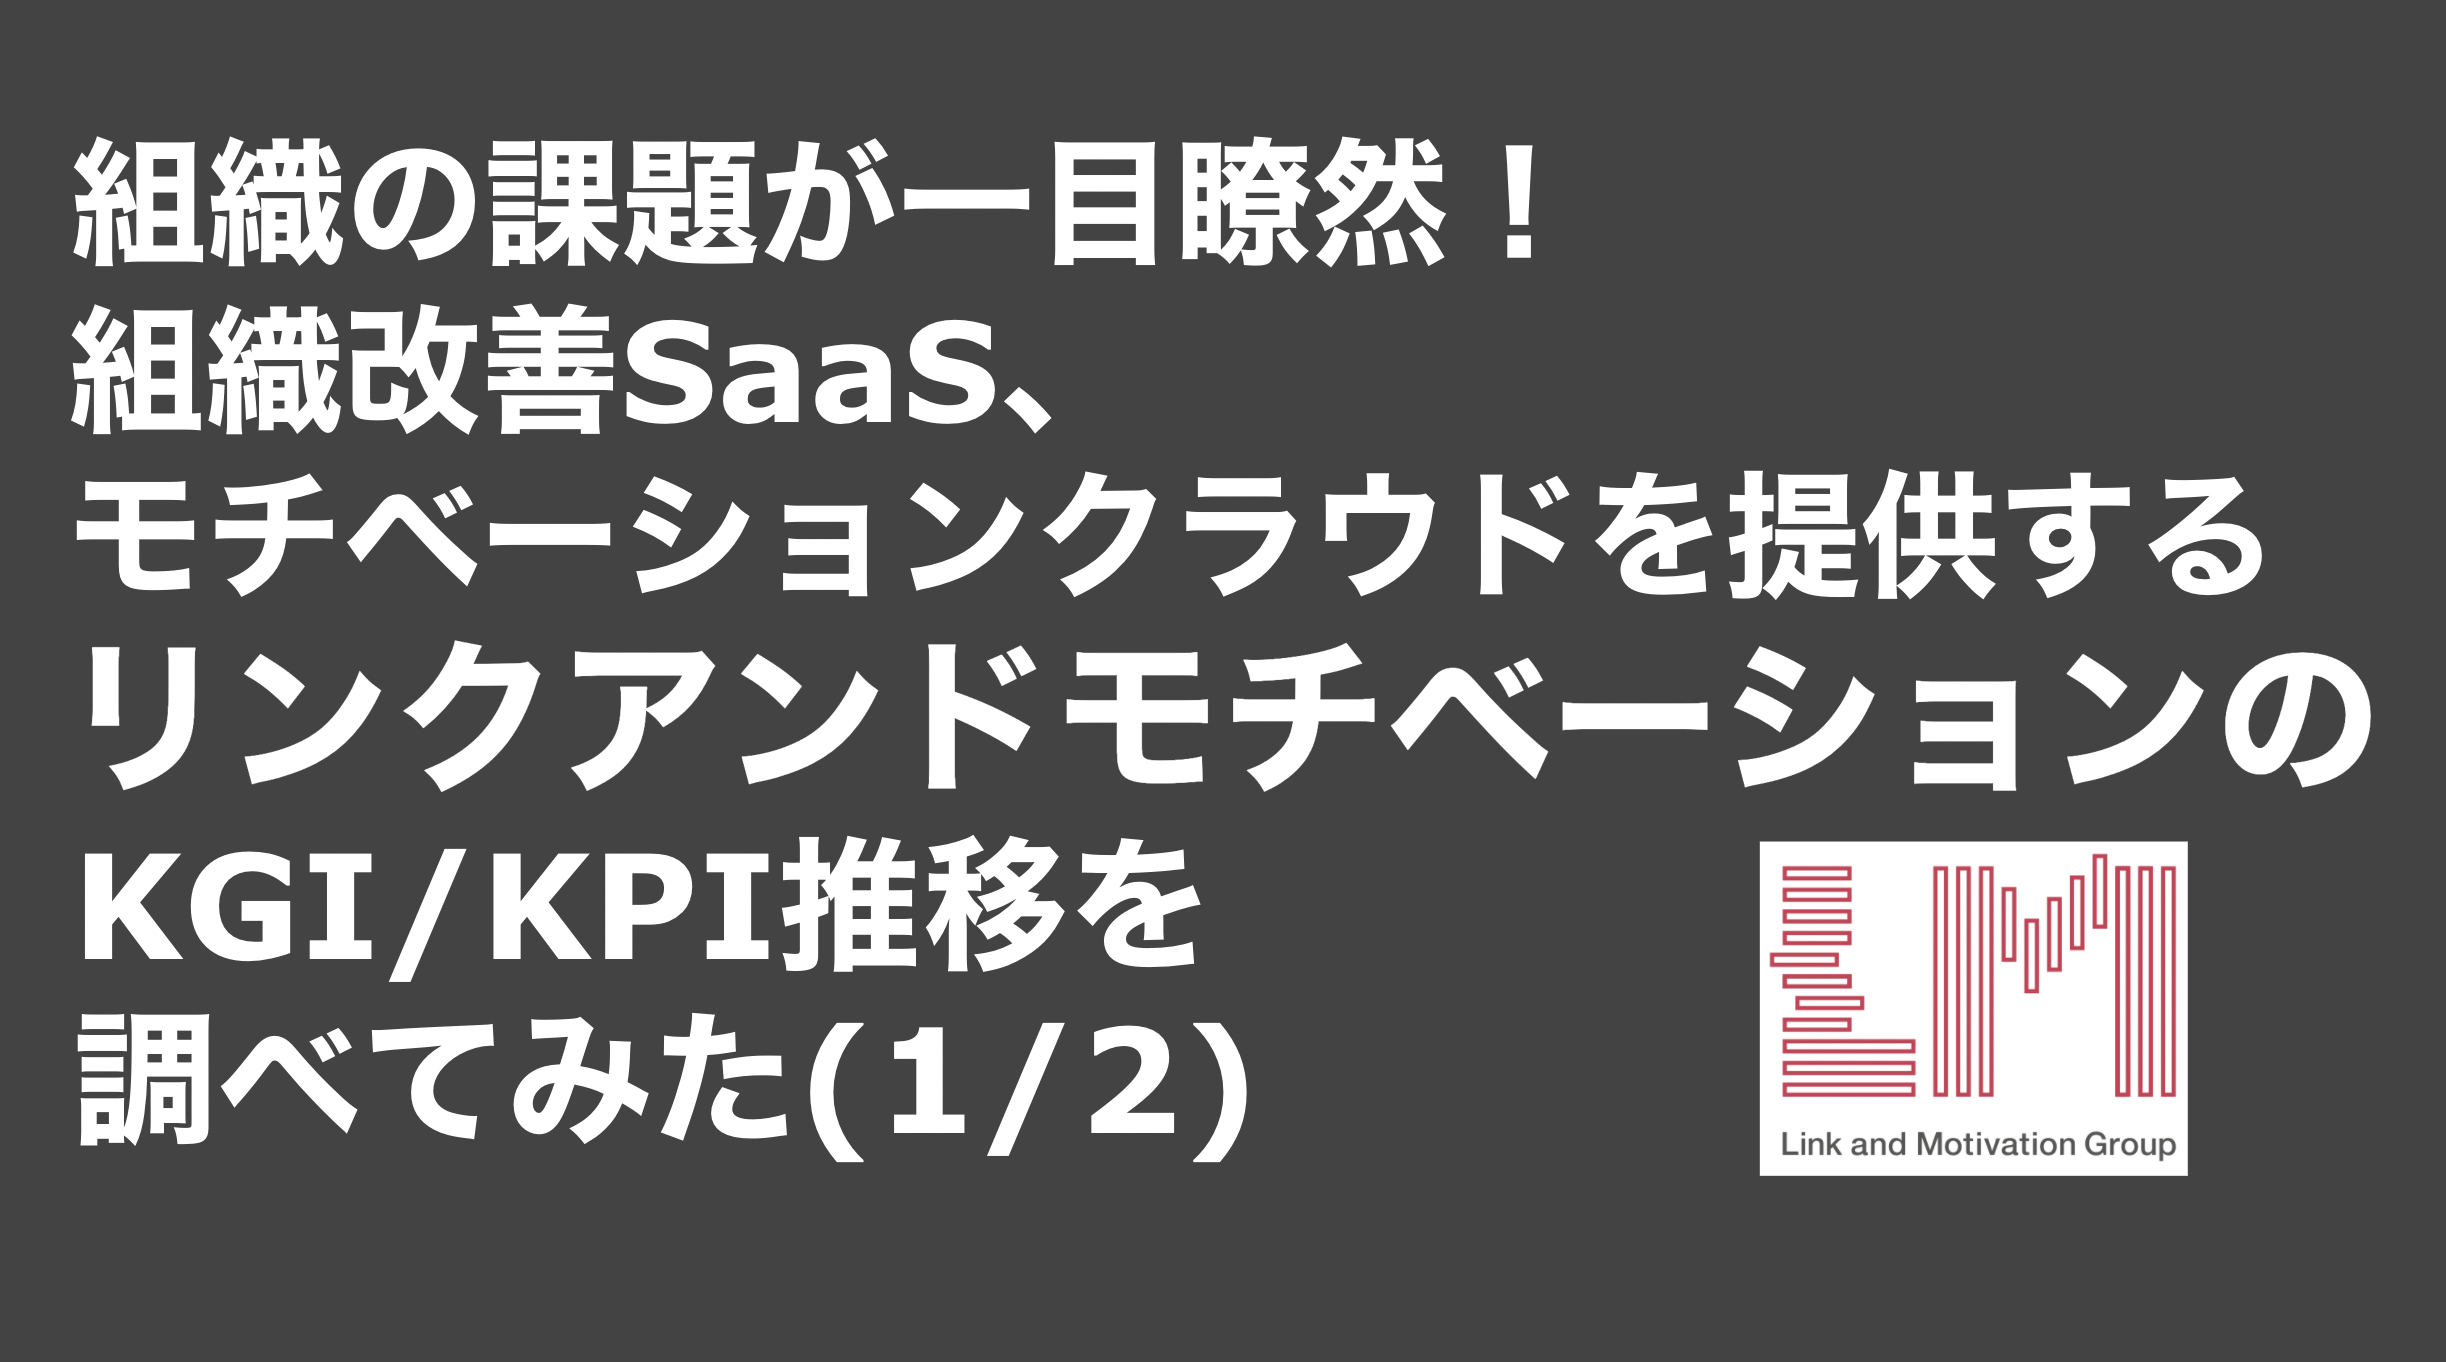 saaslife_ 組織の課題が一目瞭然!組織改善SaaS、モチベーションクラウドを提供するリンクアンドモチベーションのKGI/KPI推移を調べてみた(1/2)